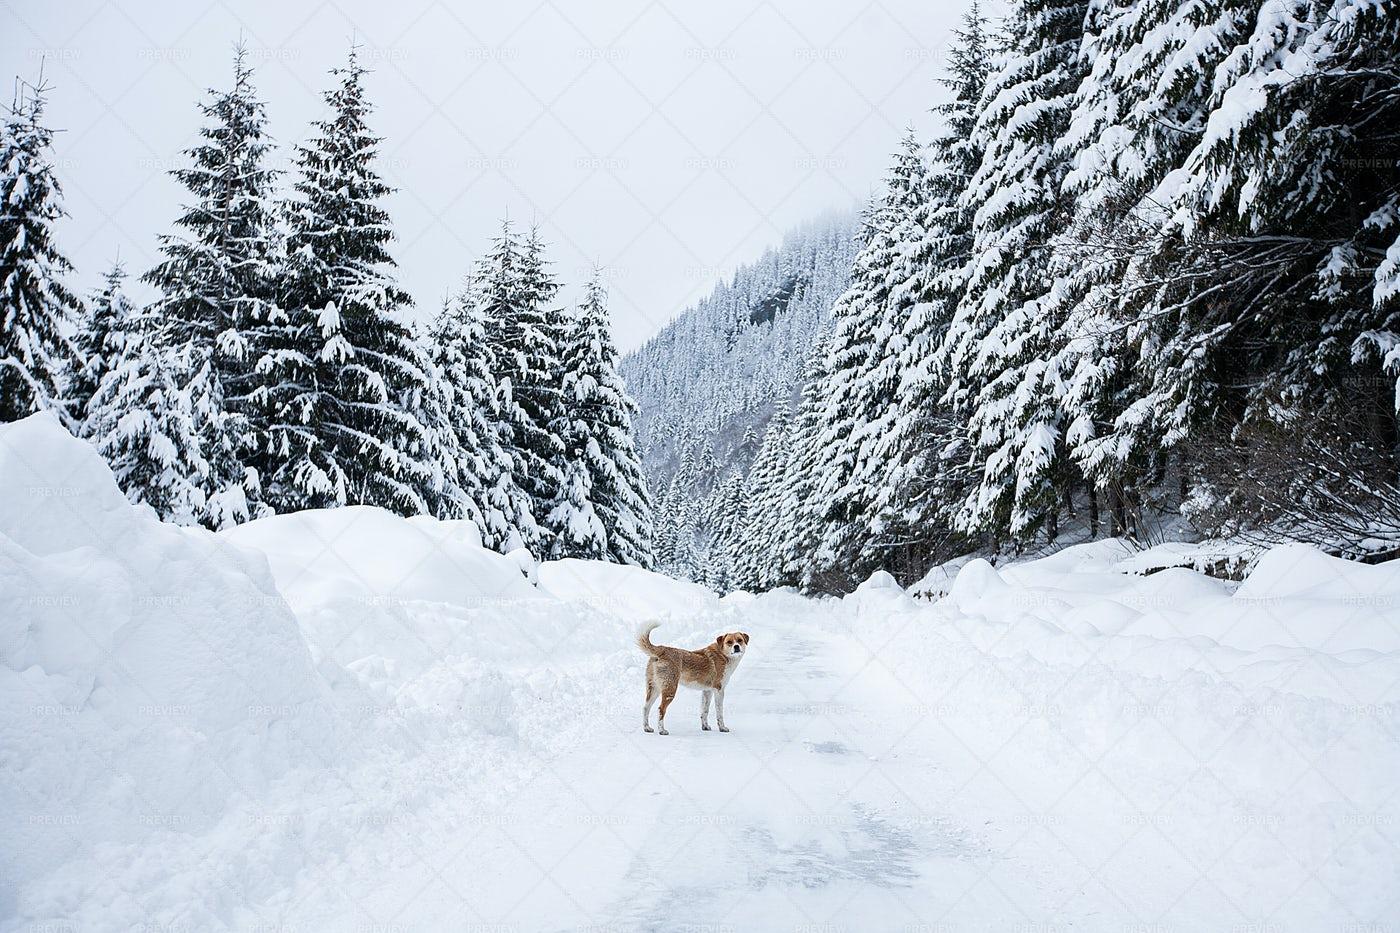 Winter And Dog: Stock Photos